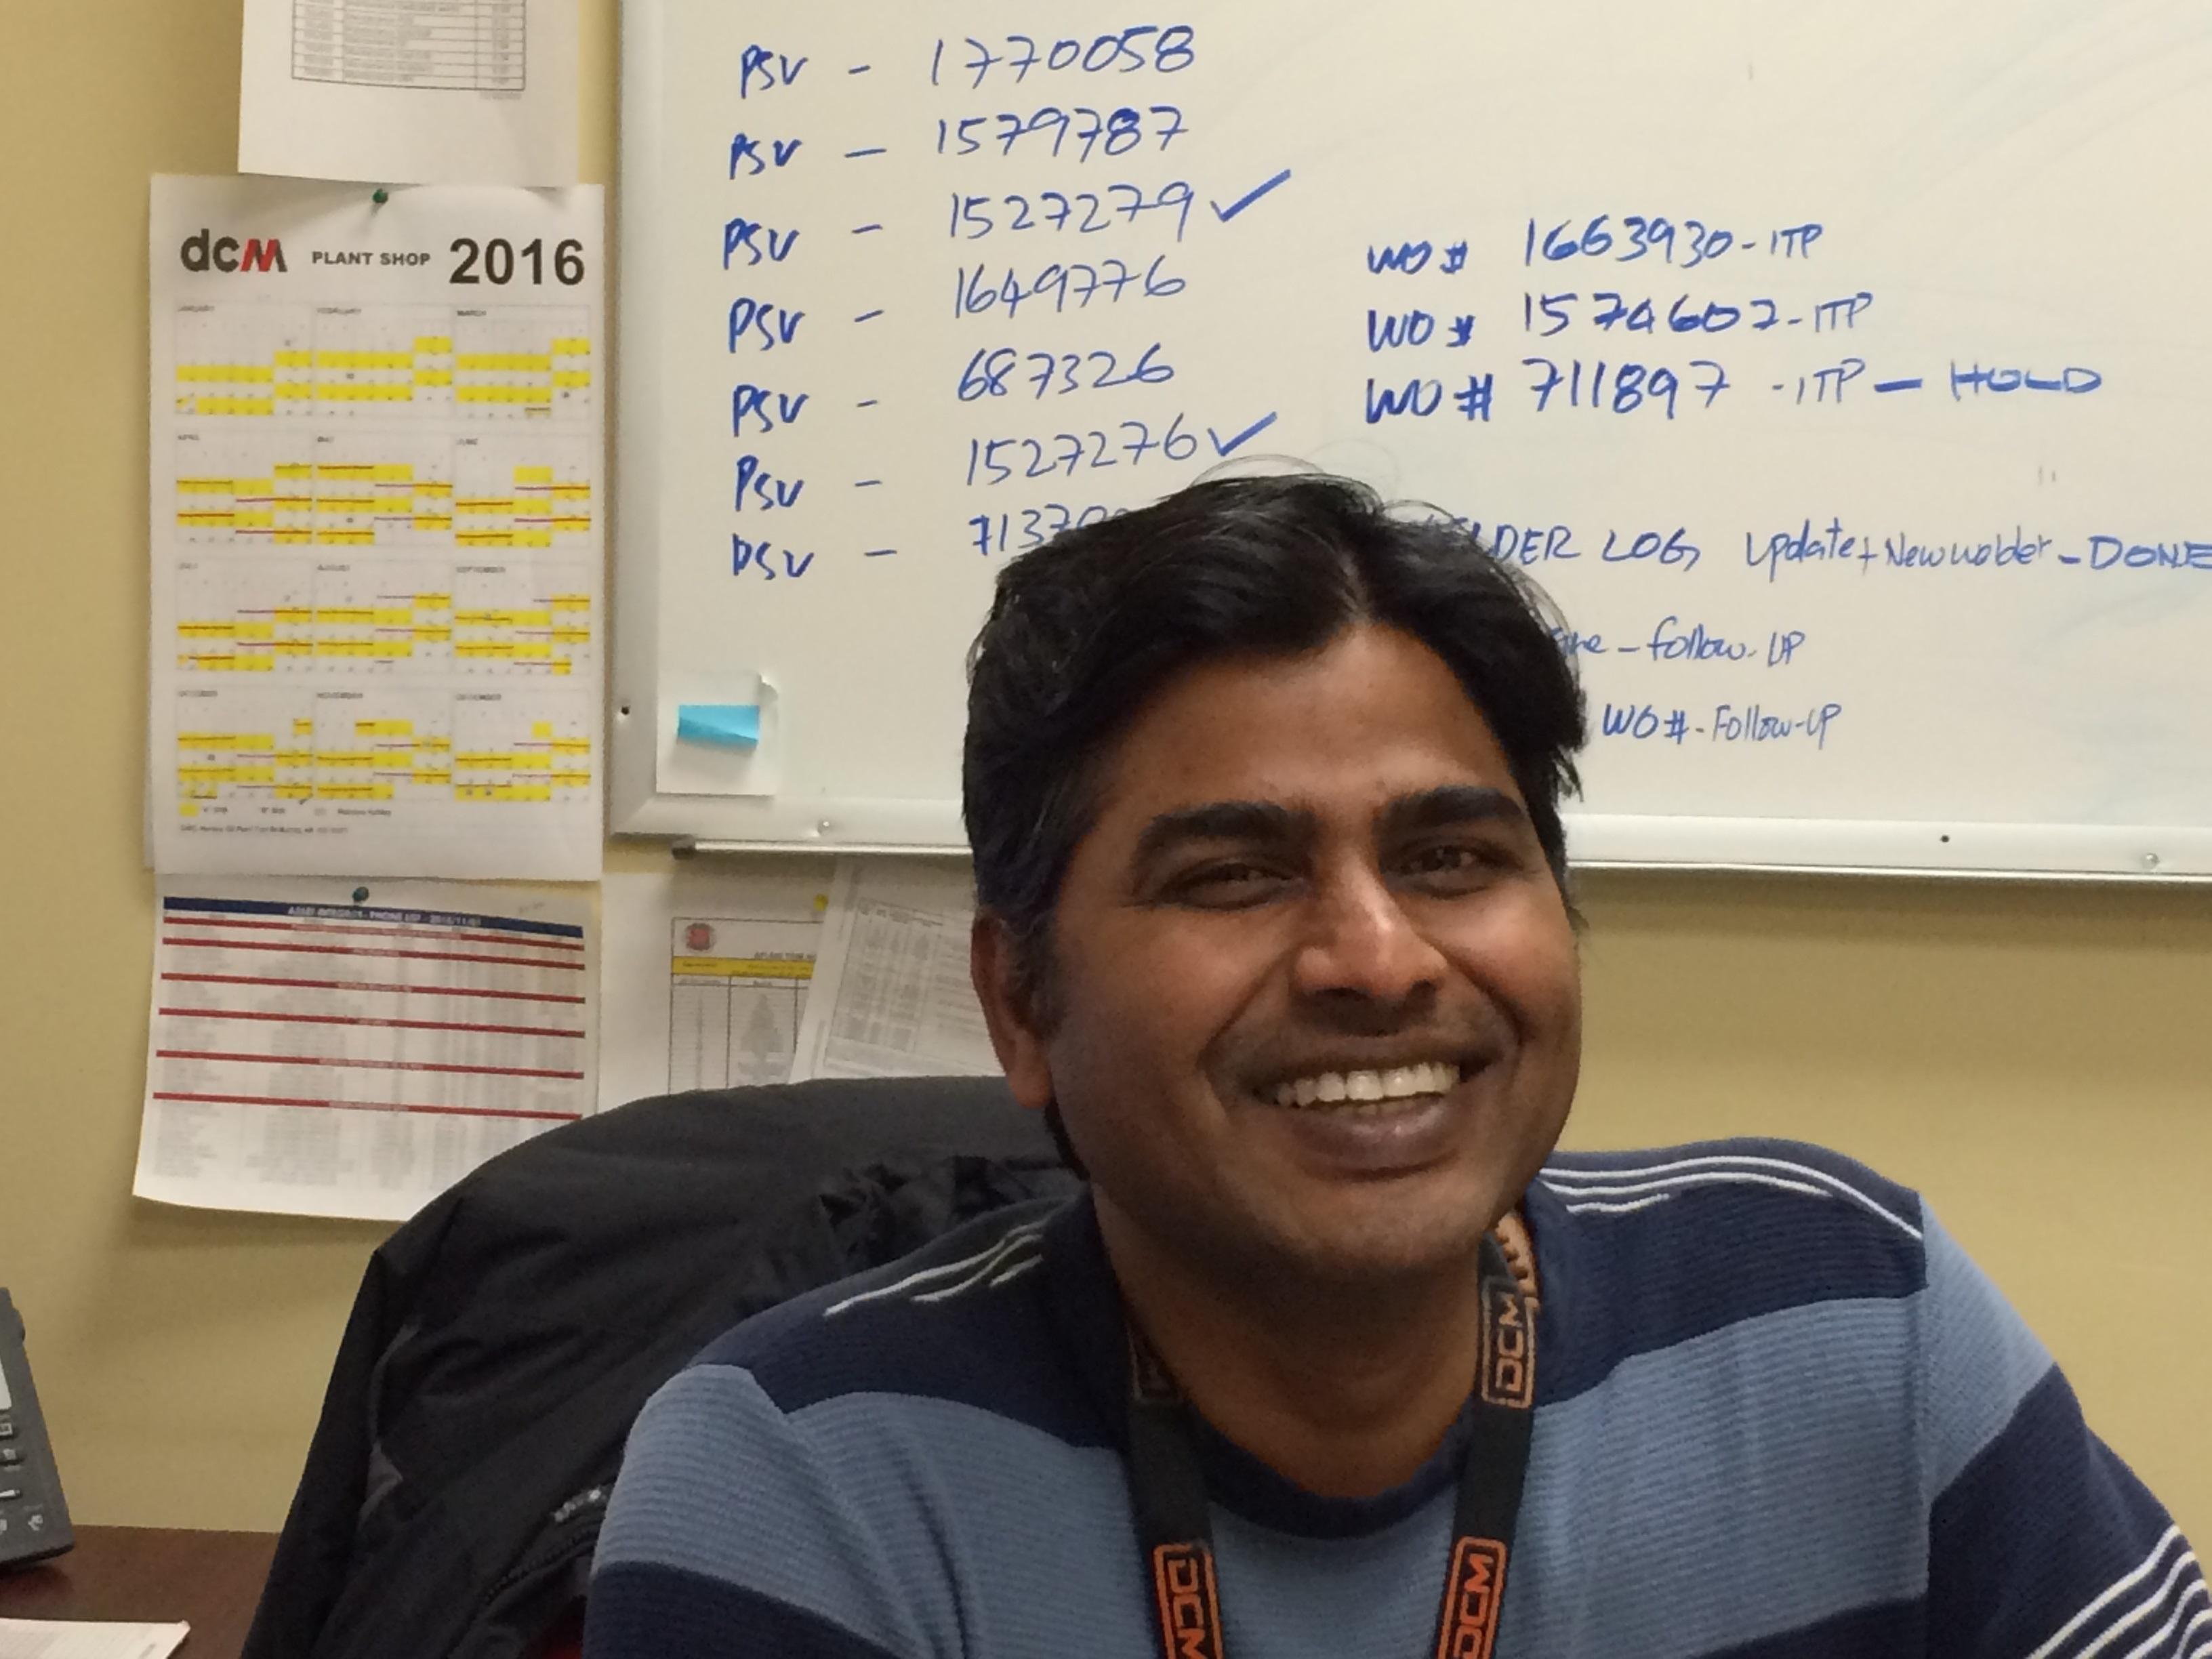 Gokul Ganesan successfully completes his ABSA Welder Examiner Paper 3